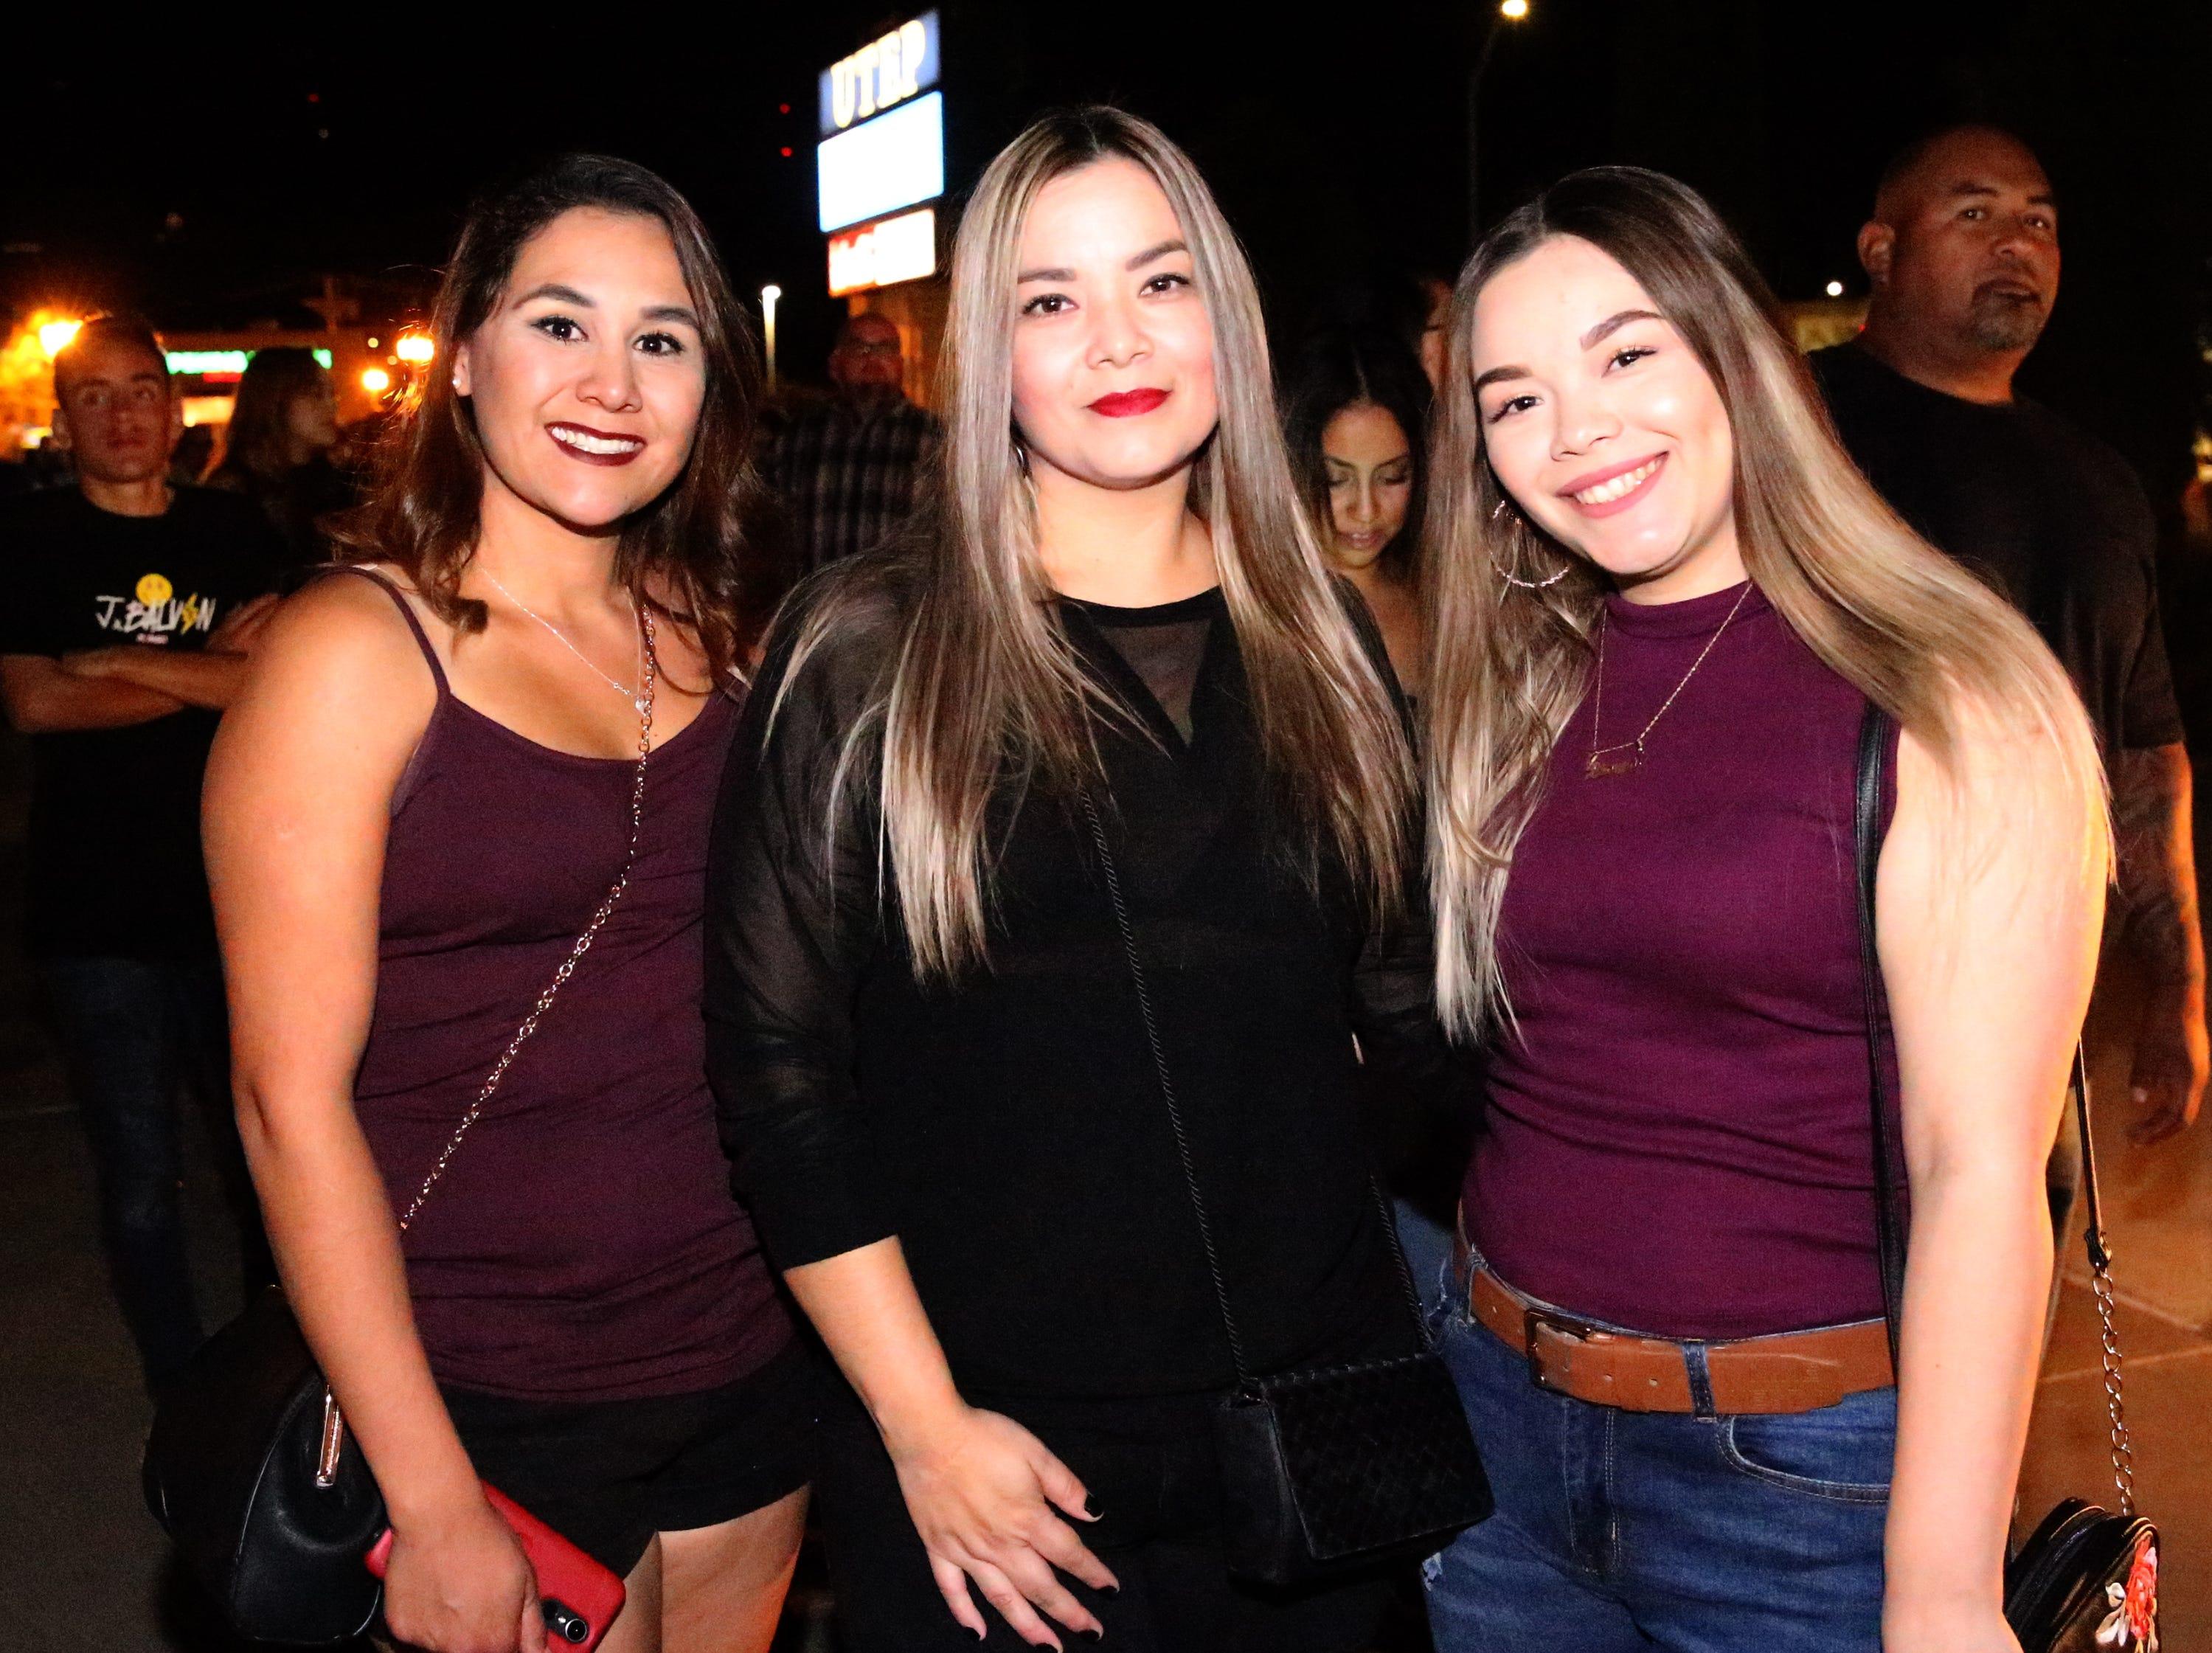 L-R: Claudia Guzman, Mayra Cruz and Bianca Quintanar.